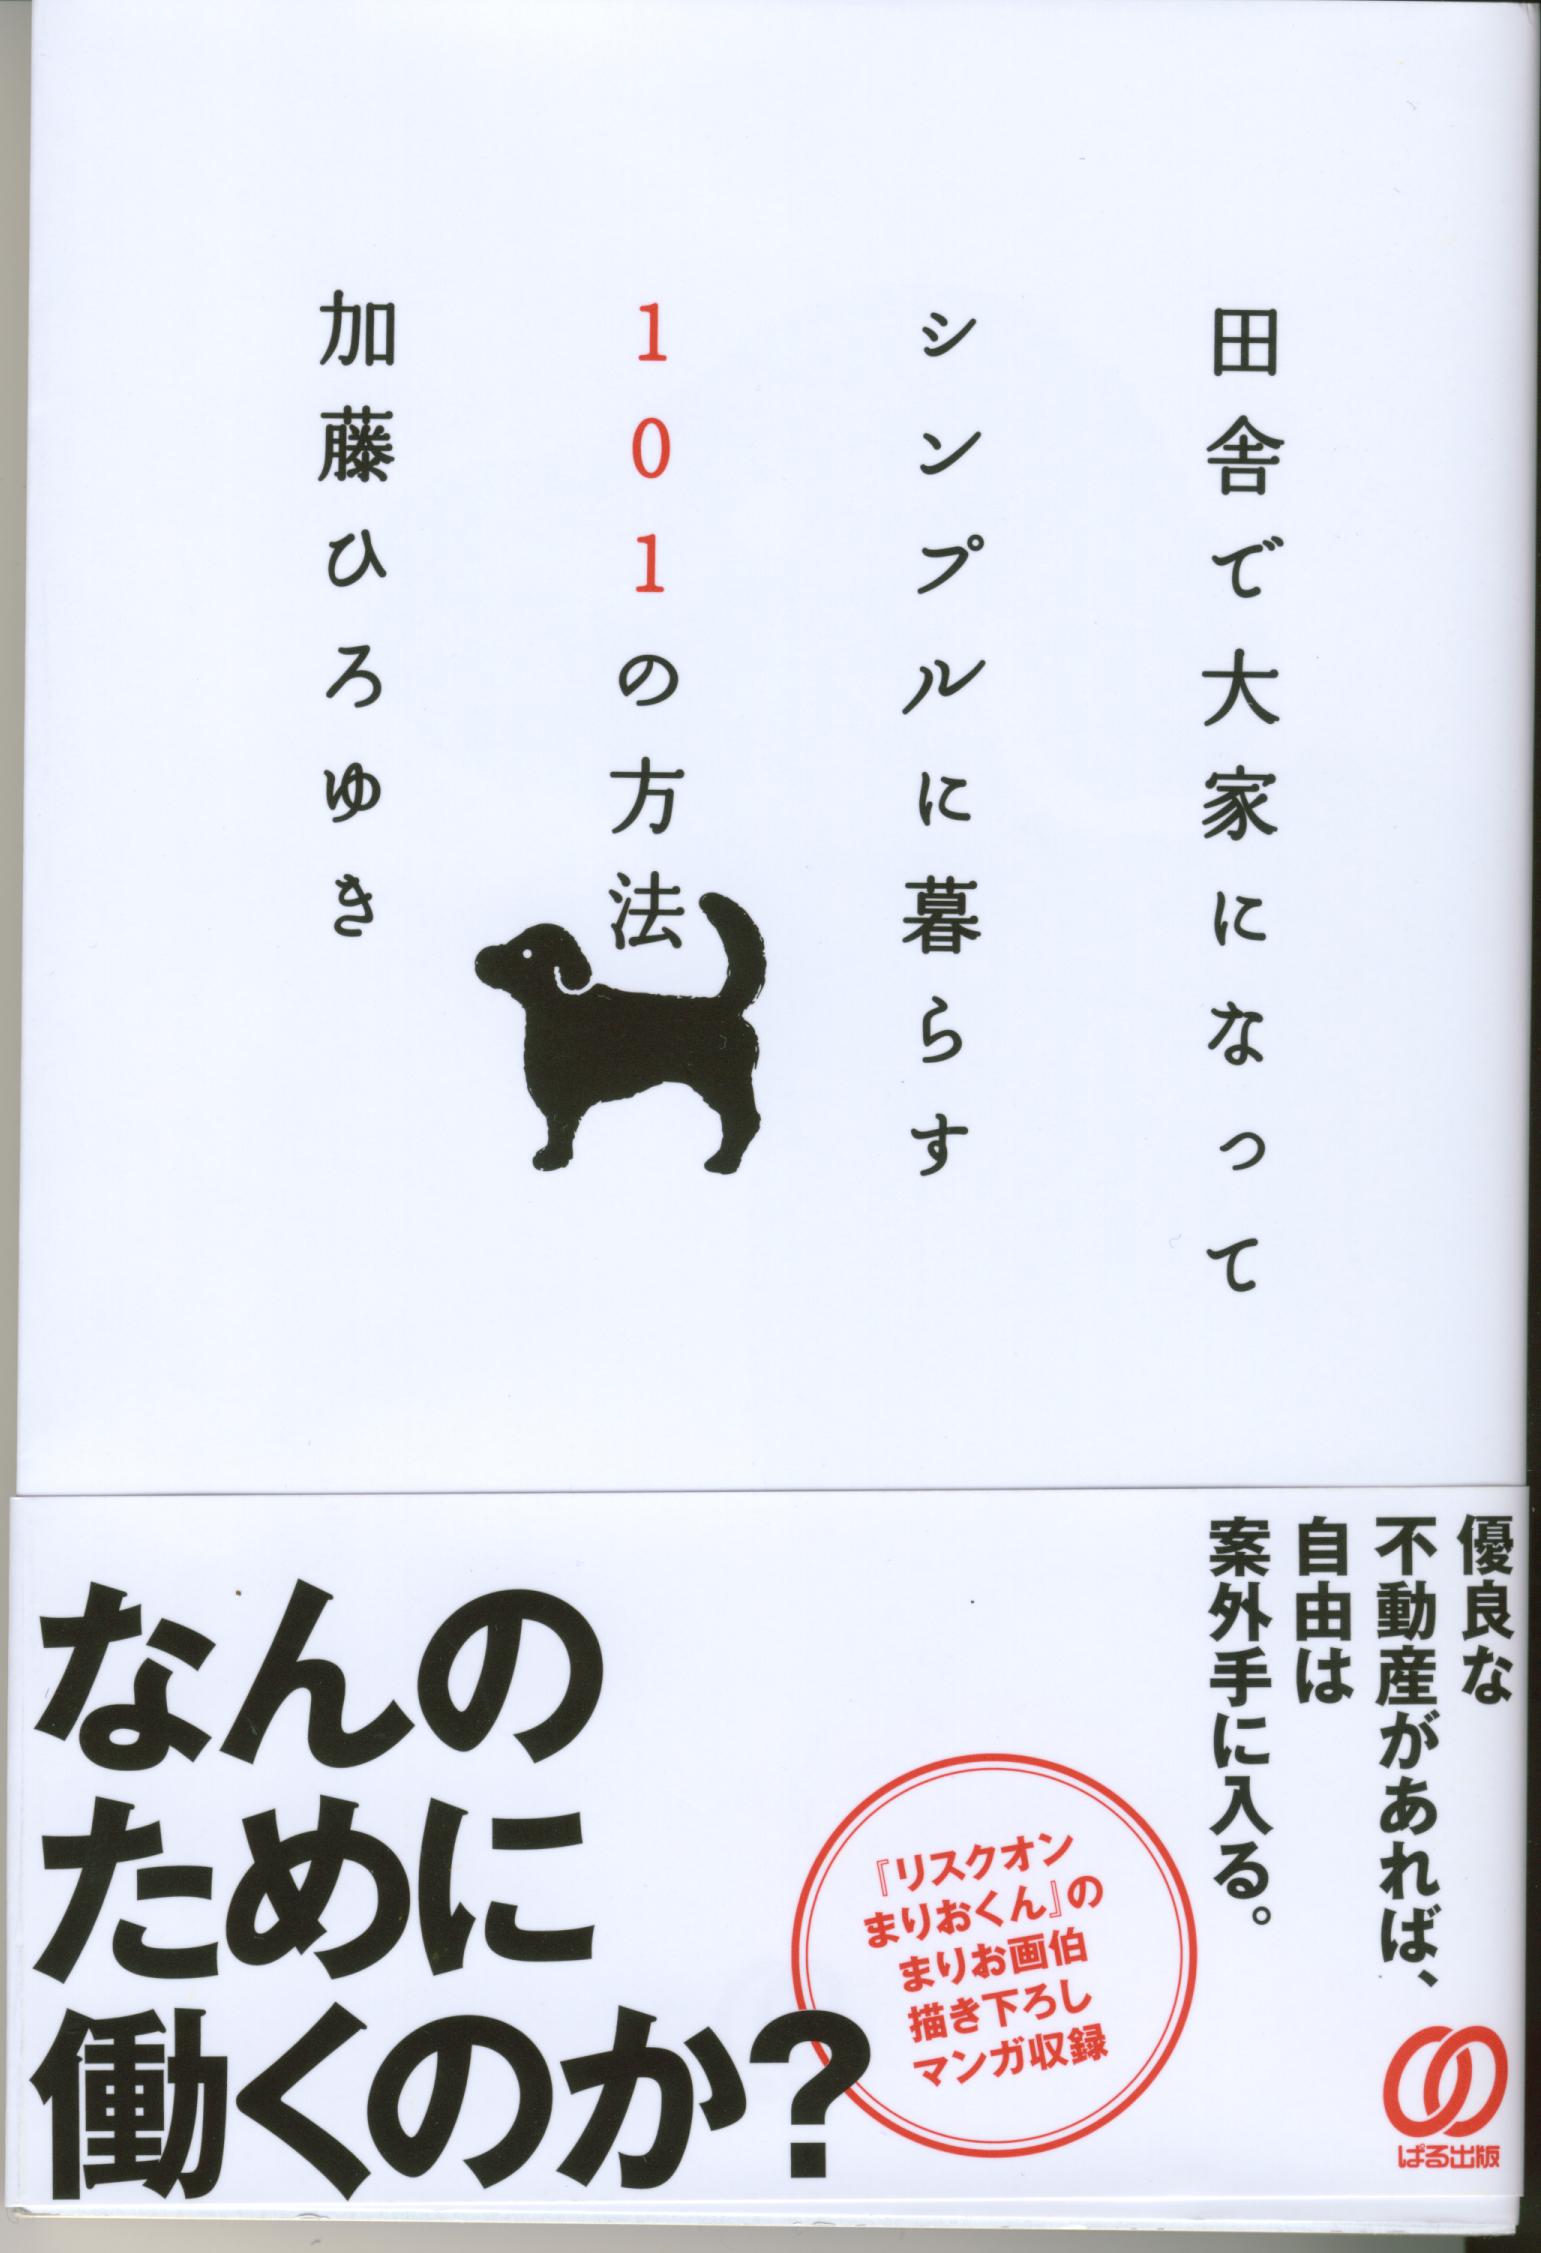 katouhiroyuki2014